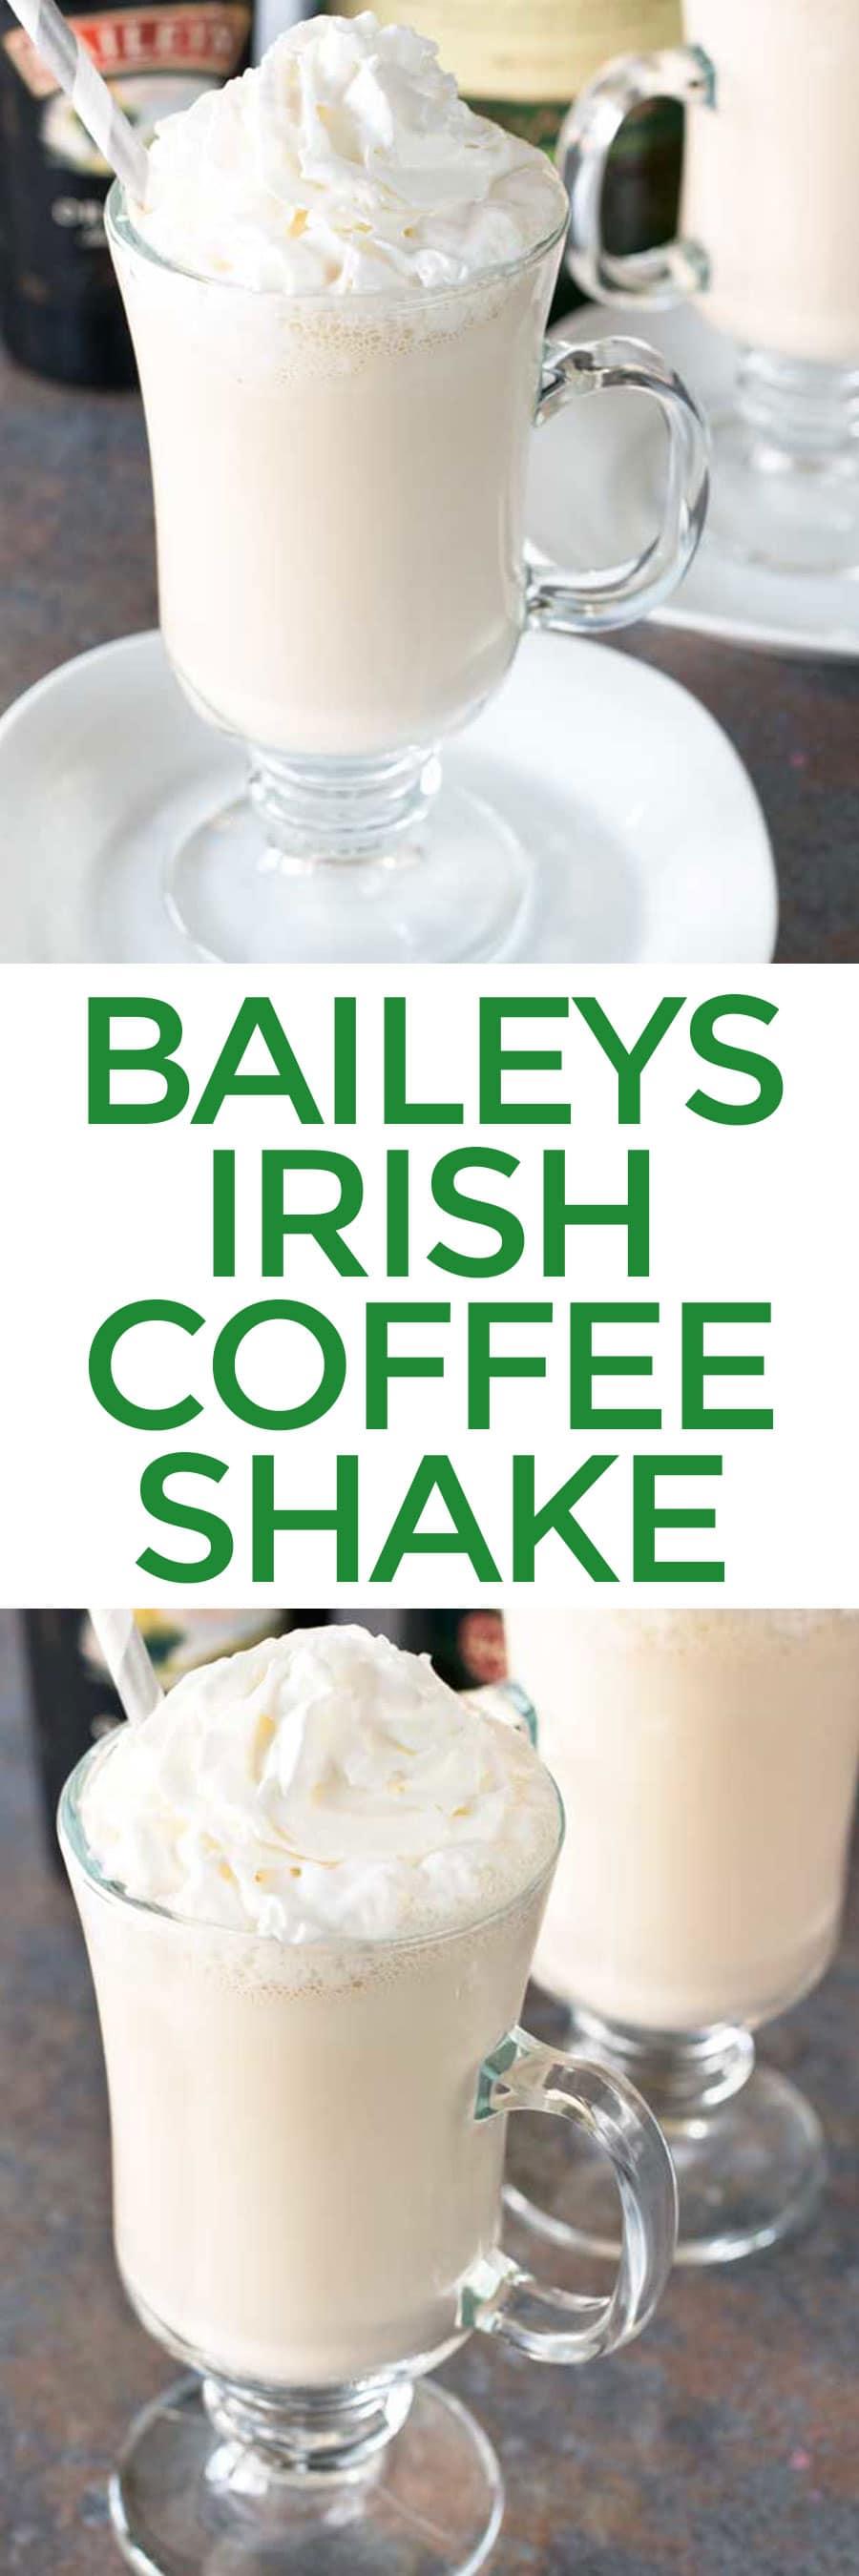 Bailey's Irish Coffee Shake   cakenknife.com #appetizer #beef #snack #stpatricksday